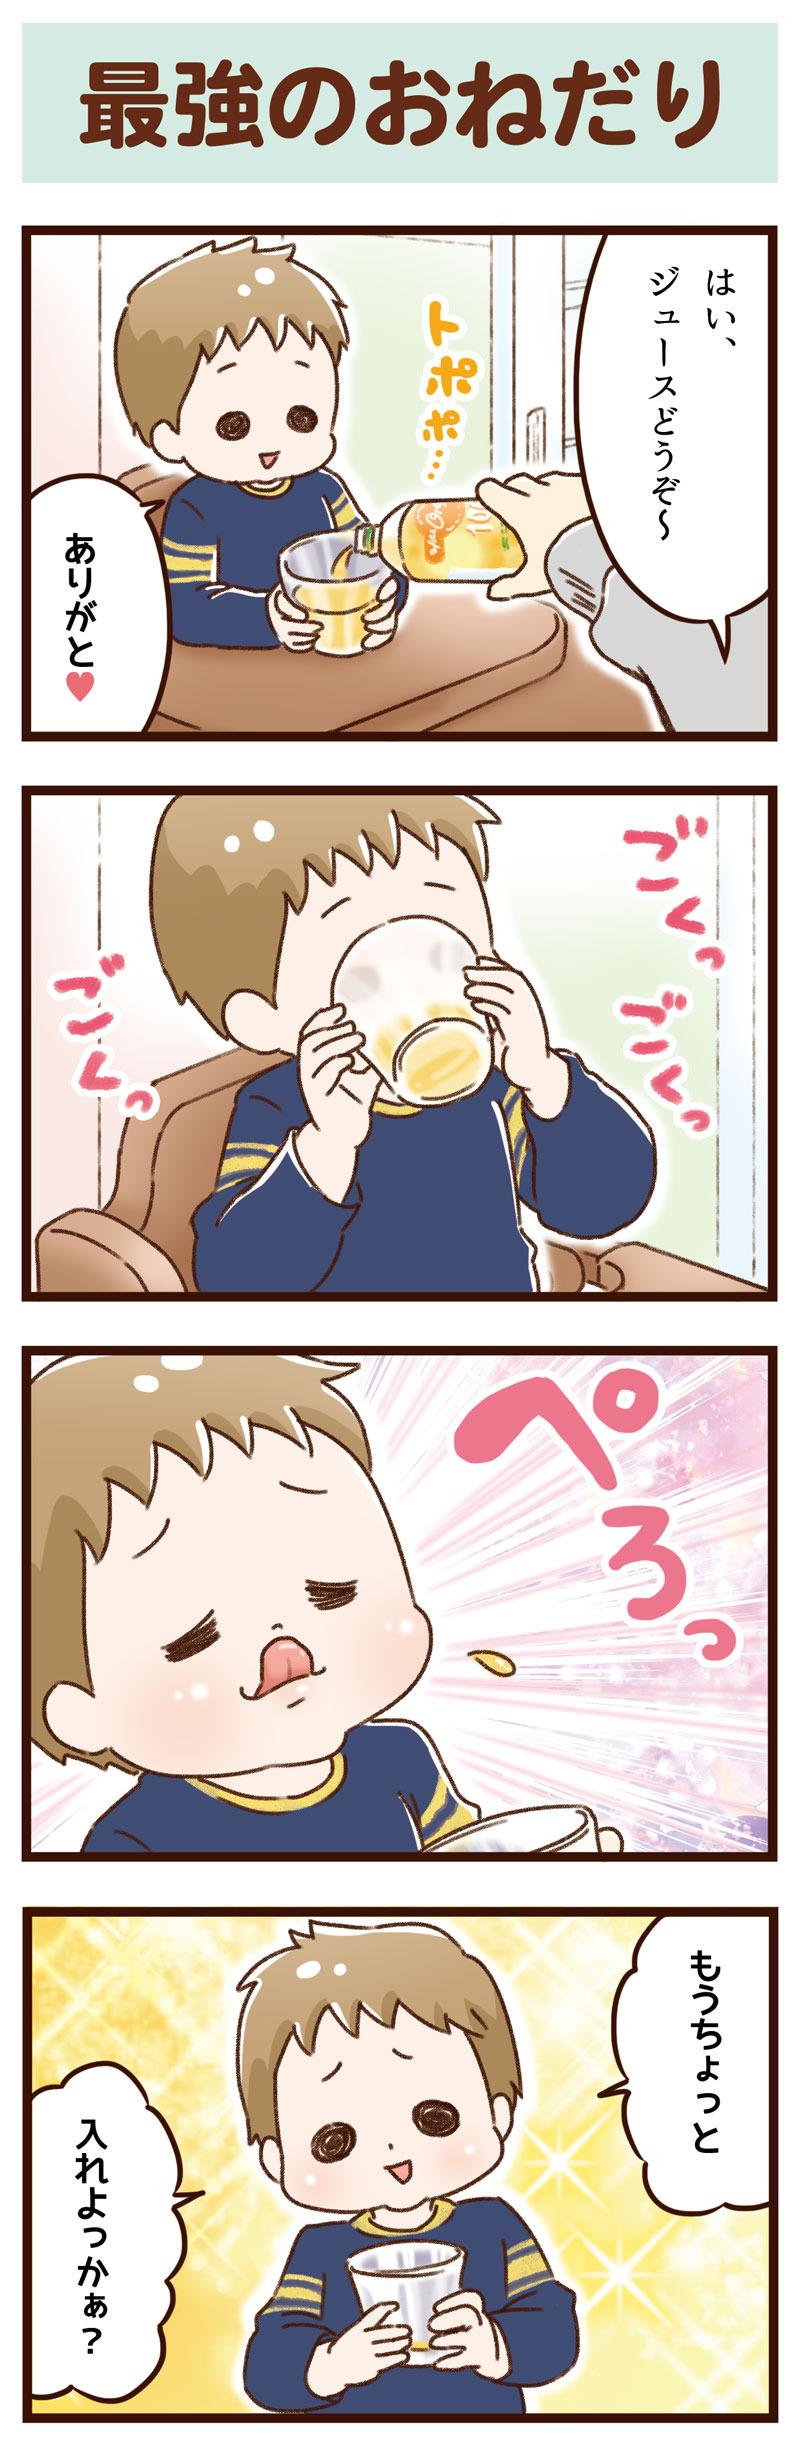 yumui269-1